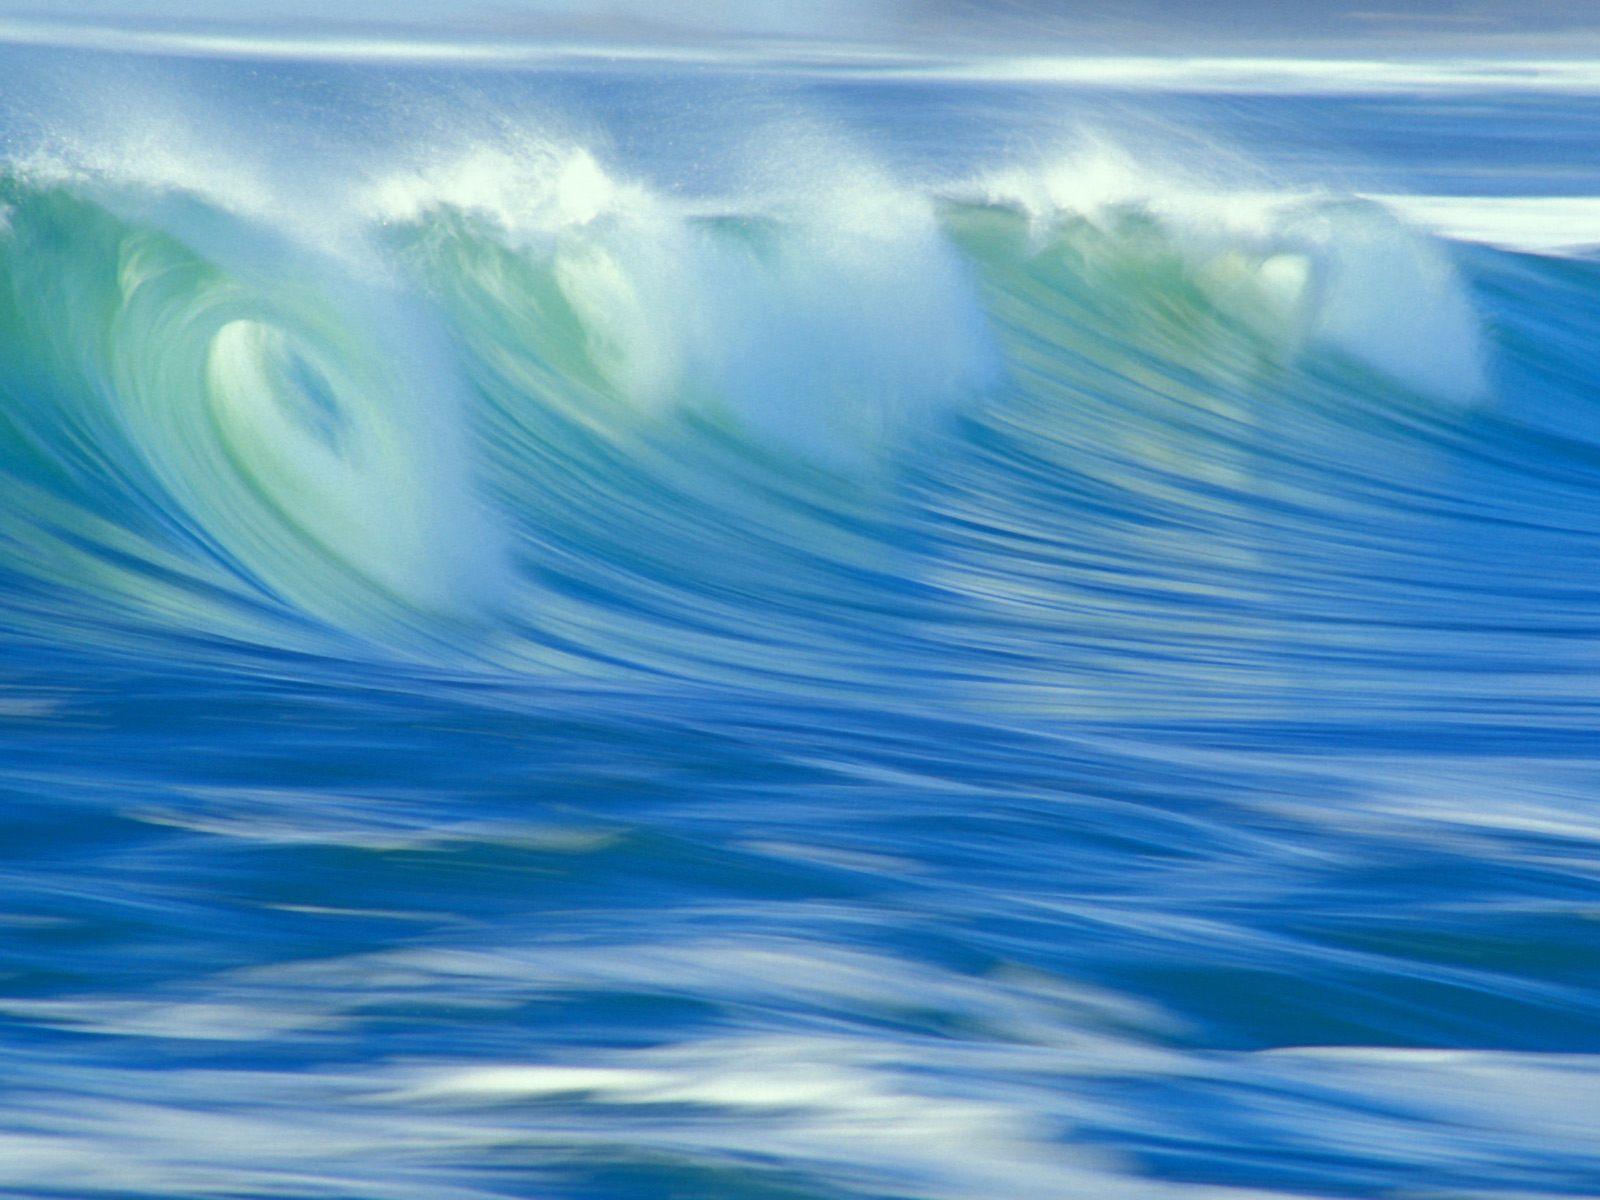 wallpaper: Best Collection Of Ocean Wallpapers Ever